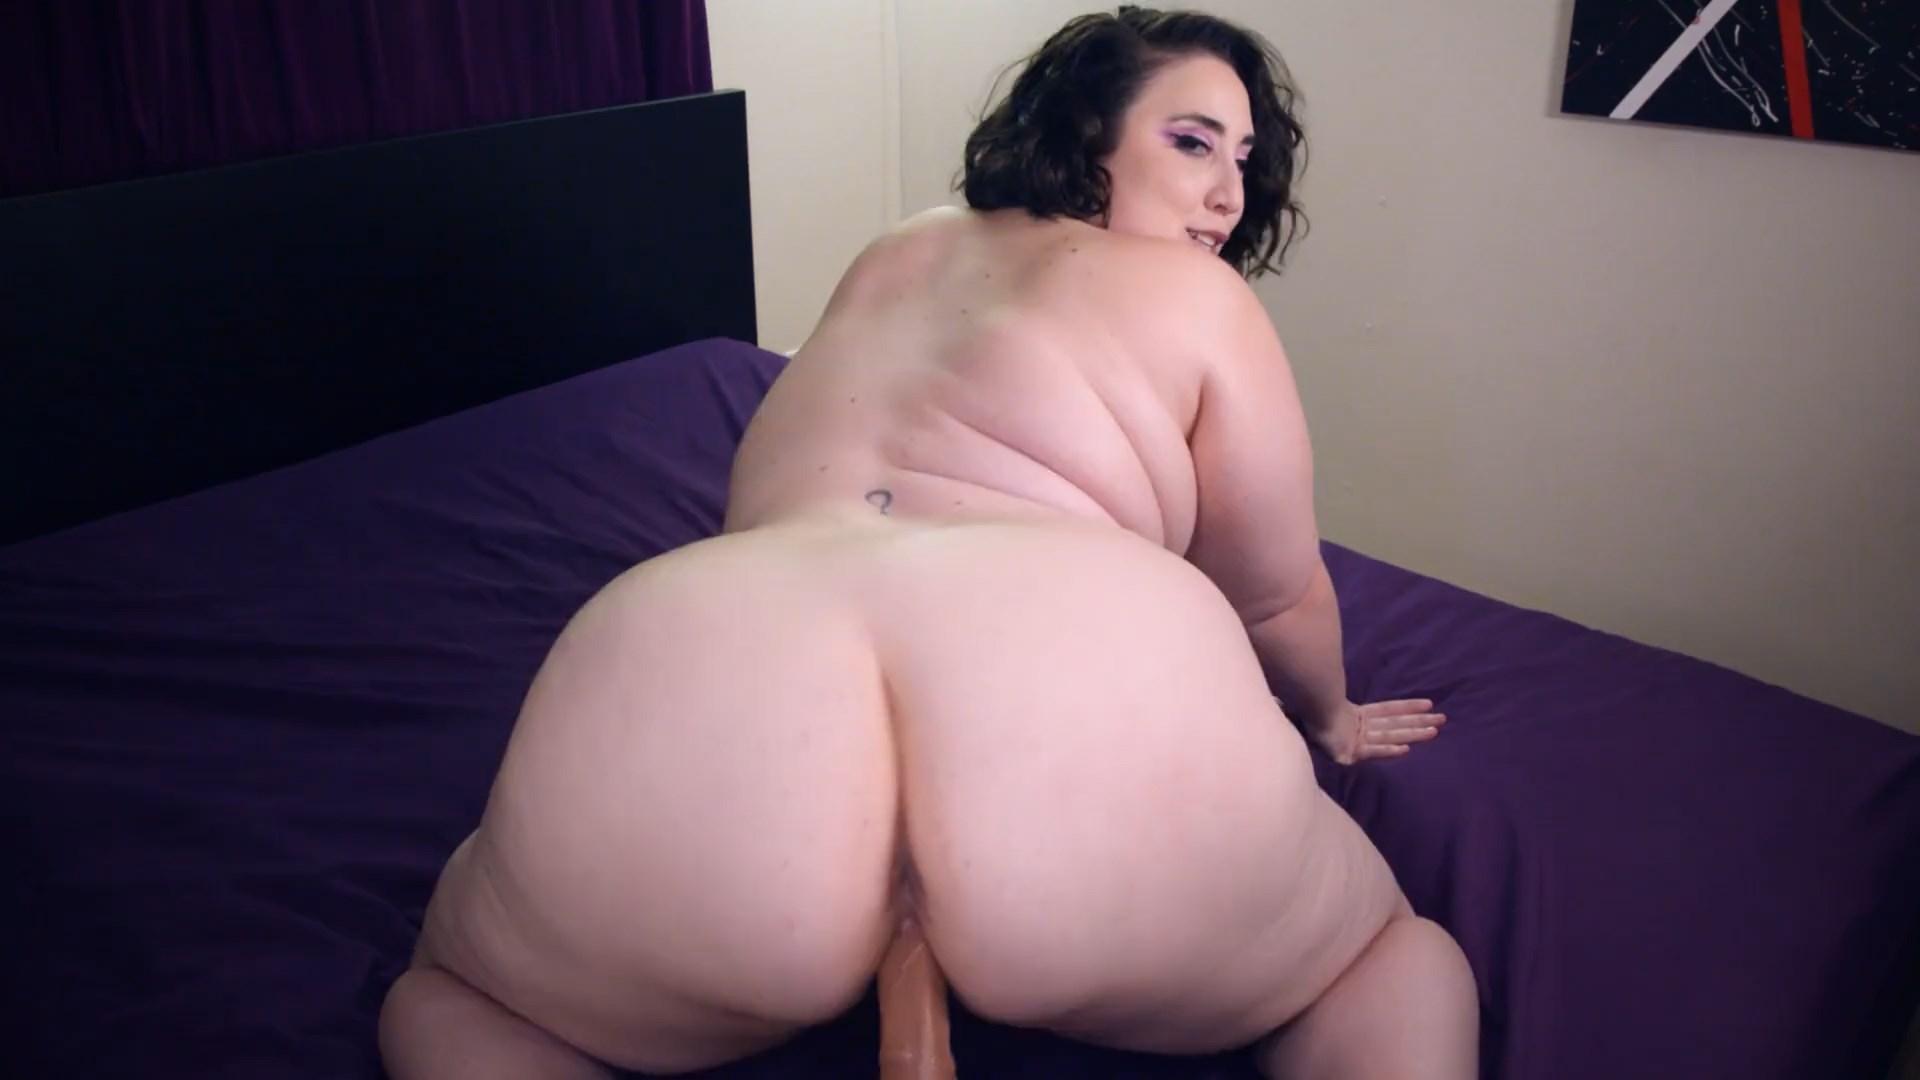 Kitty LeRoux - Mommy I Like To Fuck: Milf Taboo